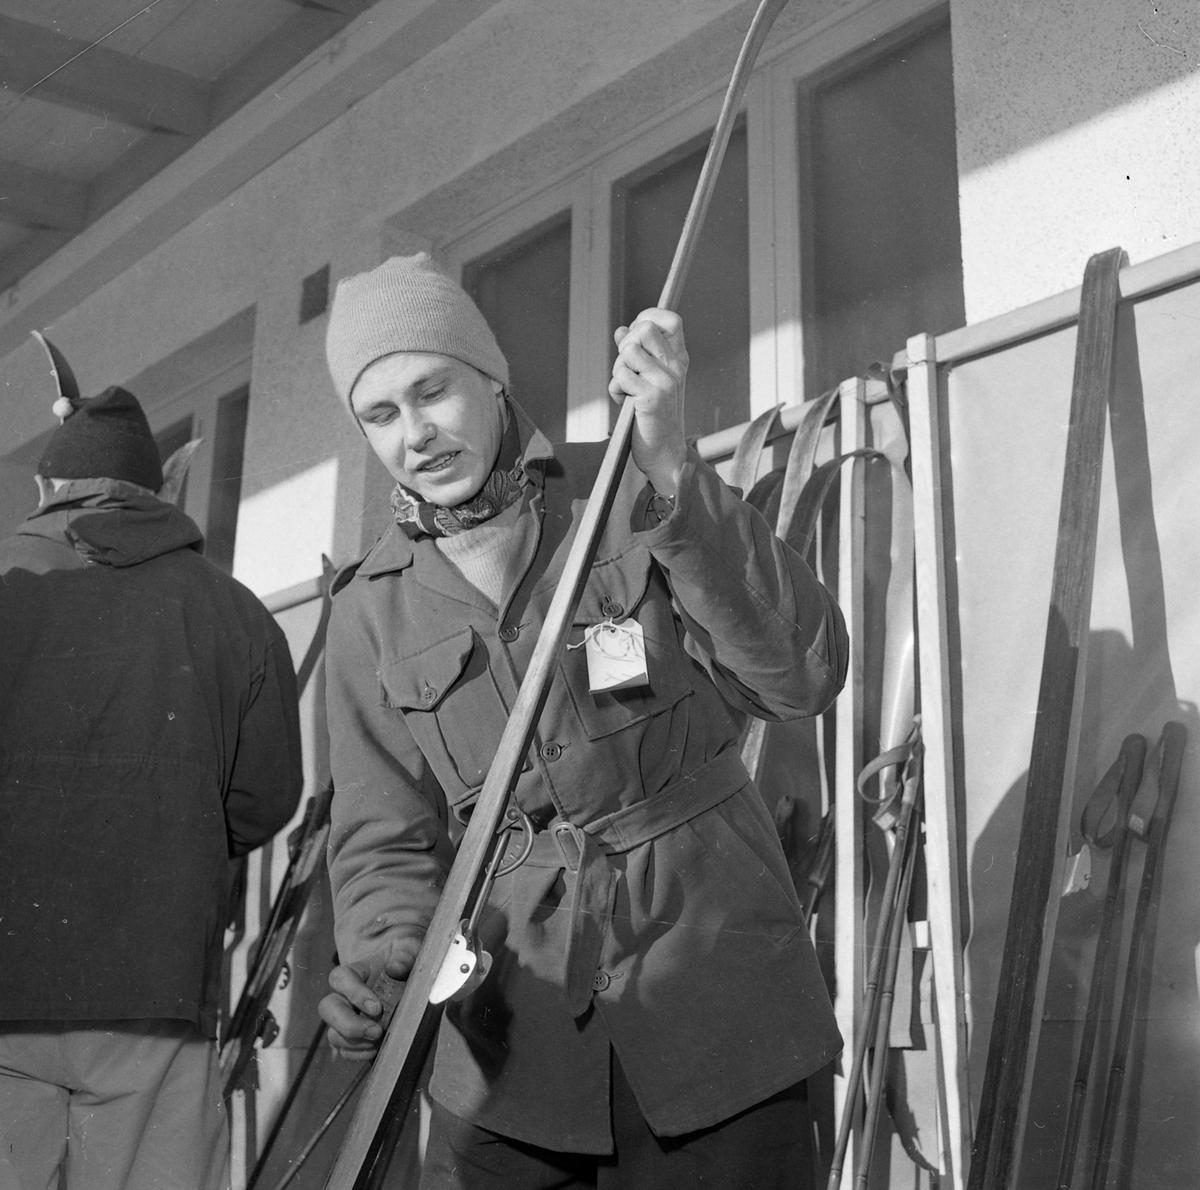 Skiløpere som deltok i NM på ski i Trondheim